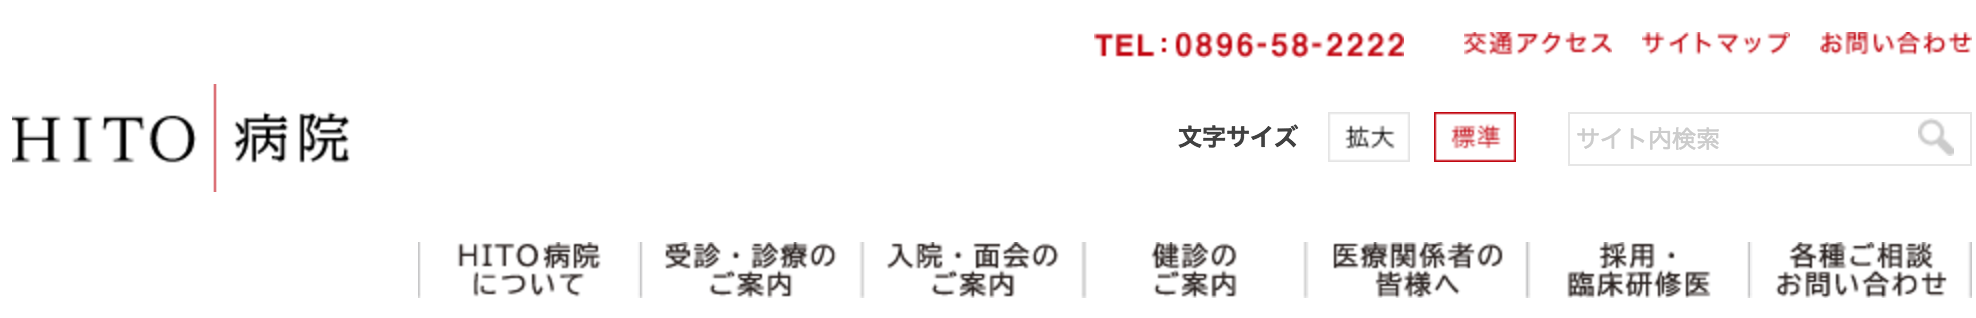 石川記念会HITO病院